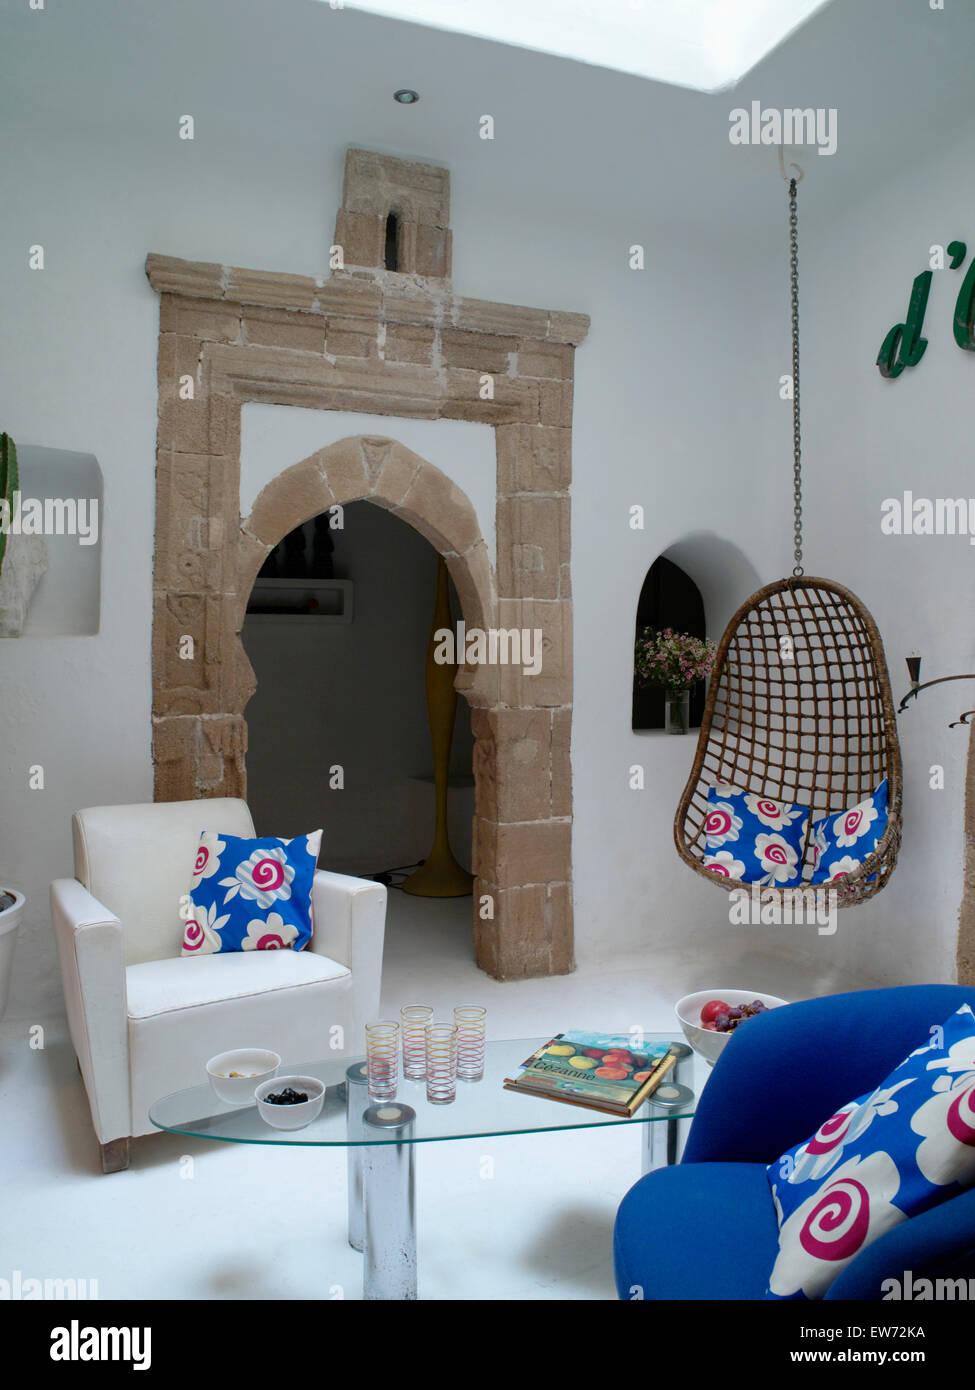 Modern Chair Furniture Monochromatic Stockfotos & Modern Chair ...